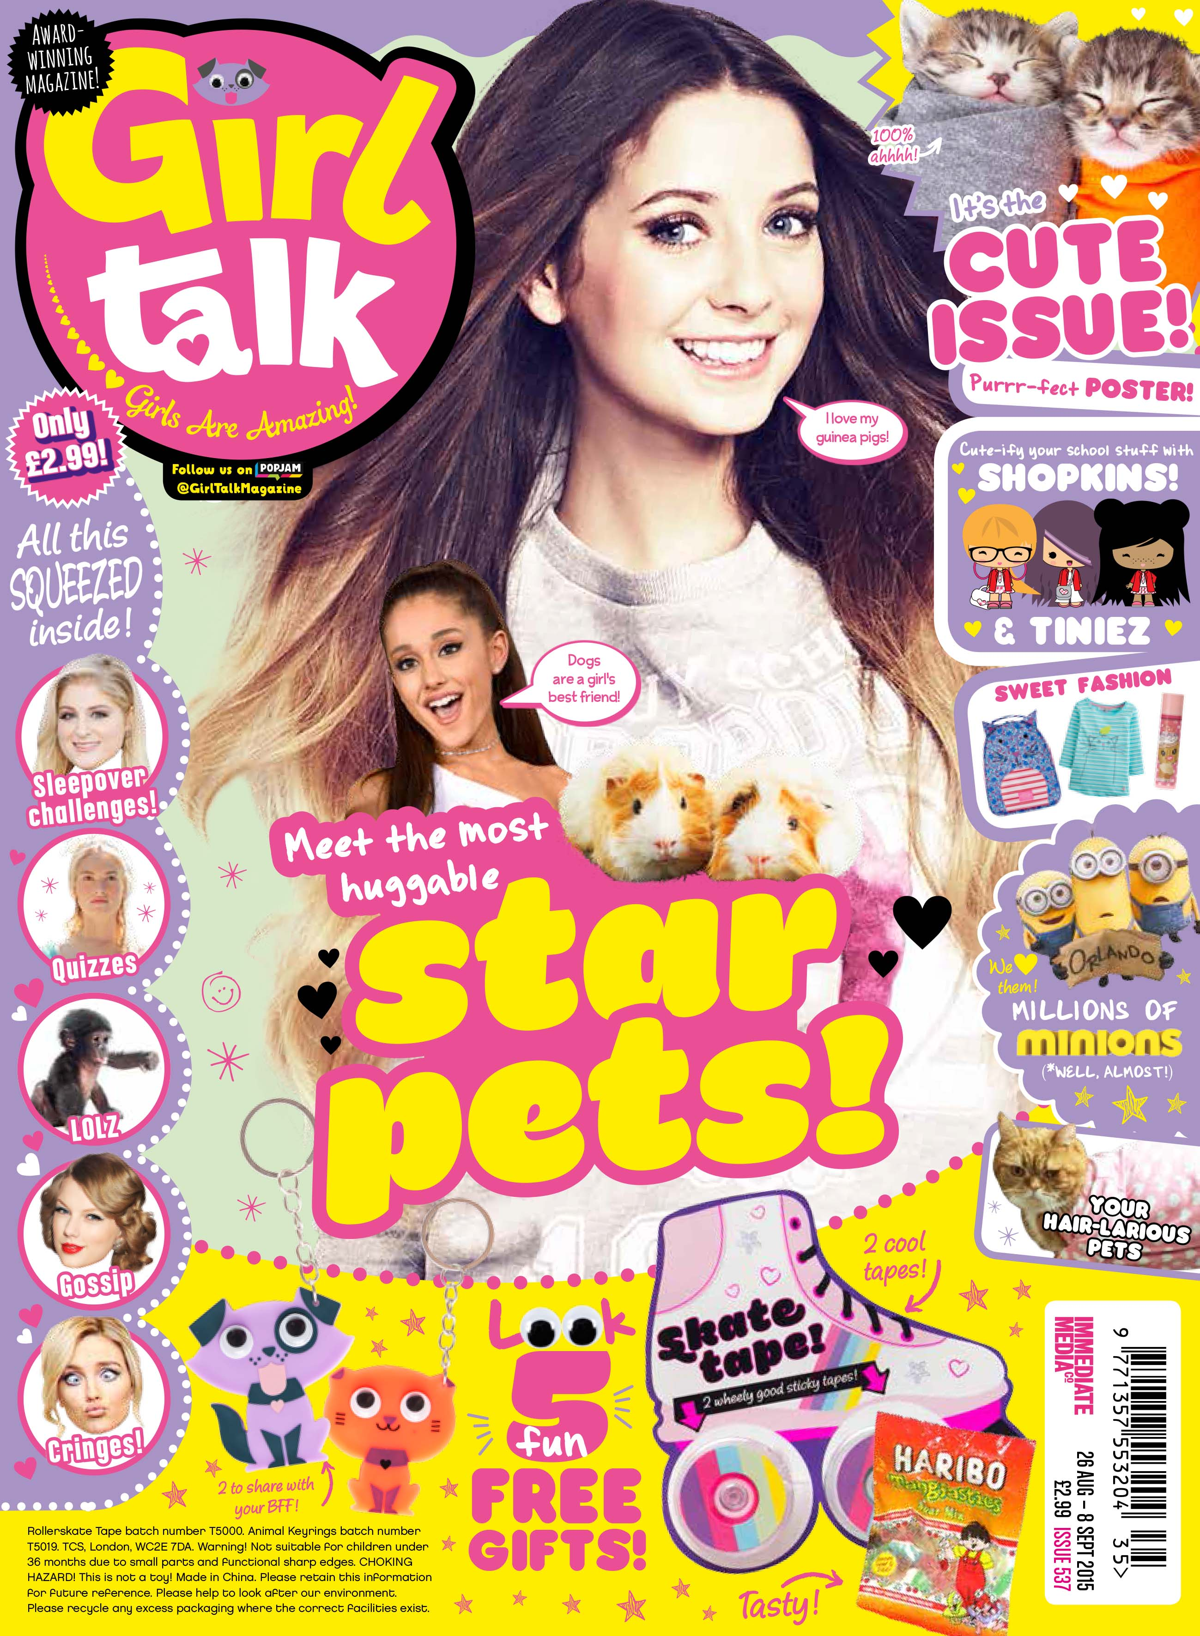 Online Calendar Uk Girls Free Online Games For Girls Gggcouk Girl Talk Magazine Fun Kids The Uks Childrens Radio